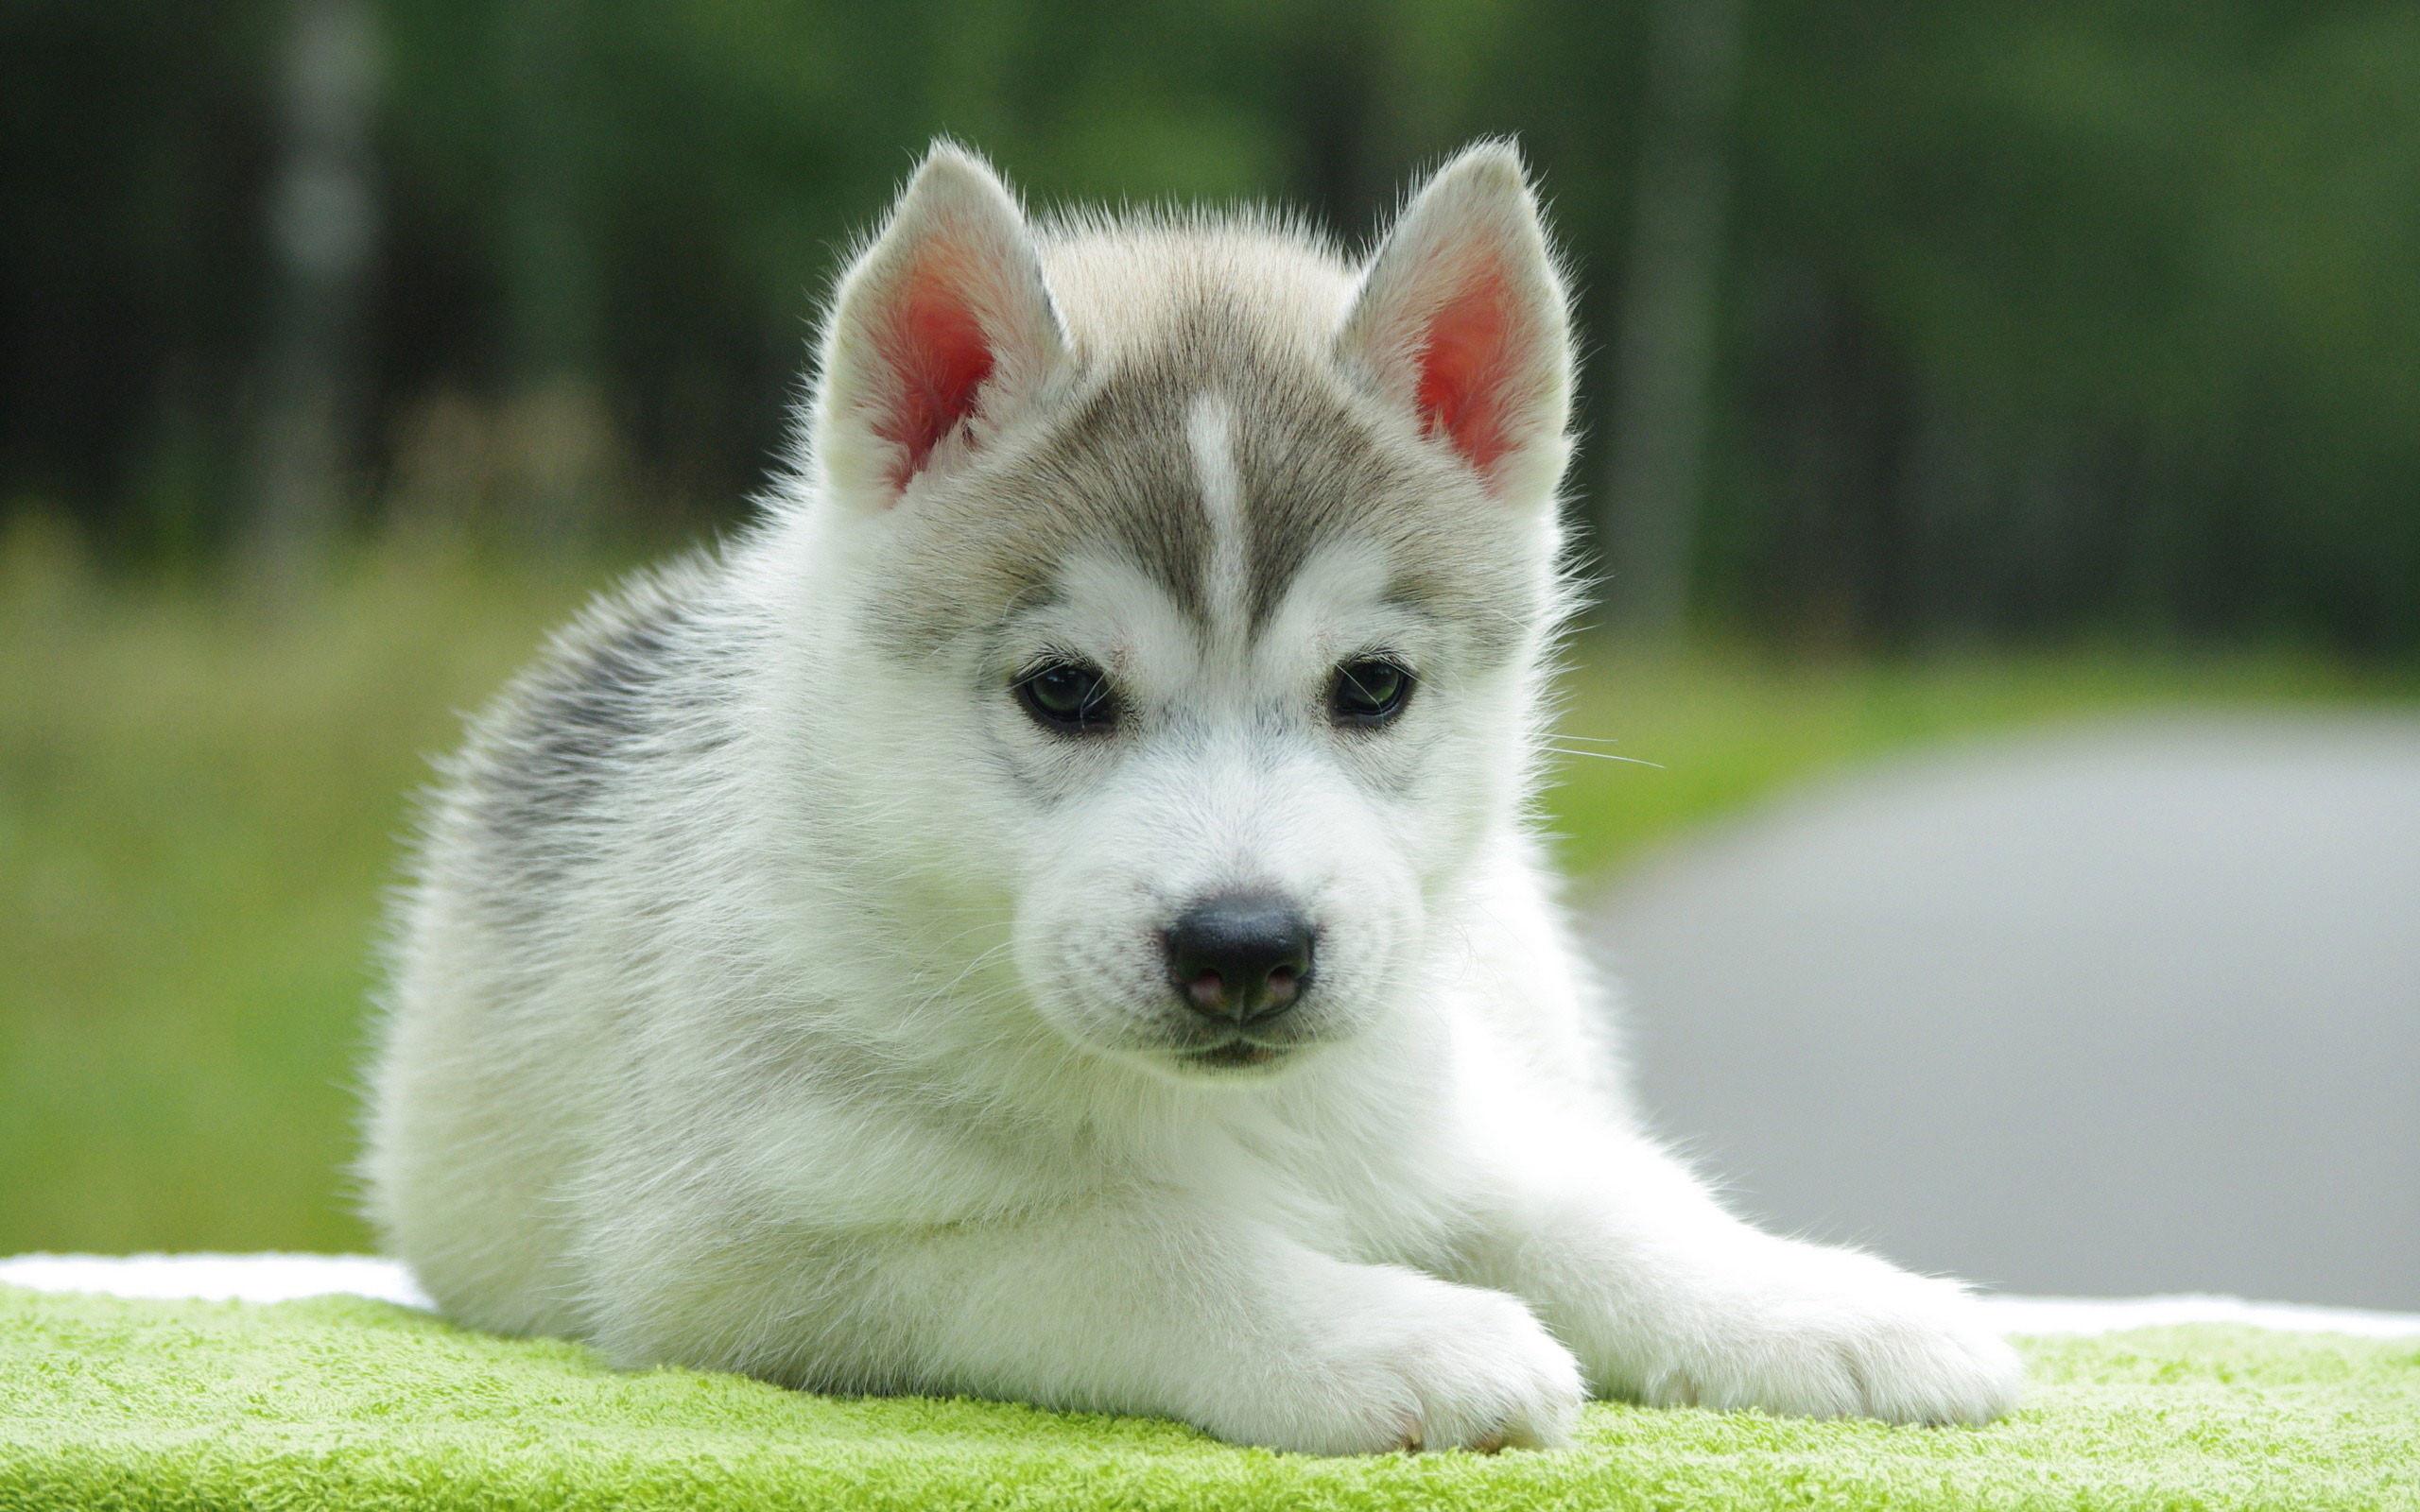 Puppy – Wallpapers, Pictures, Pics, Photos, Images   Desktop .